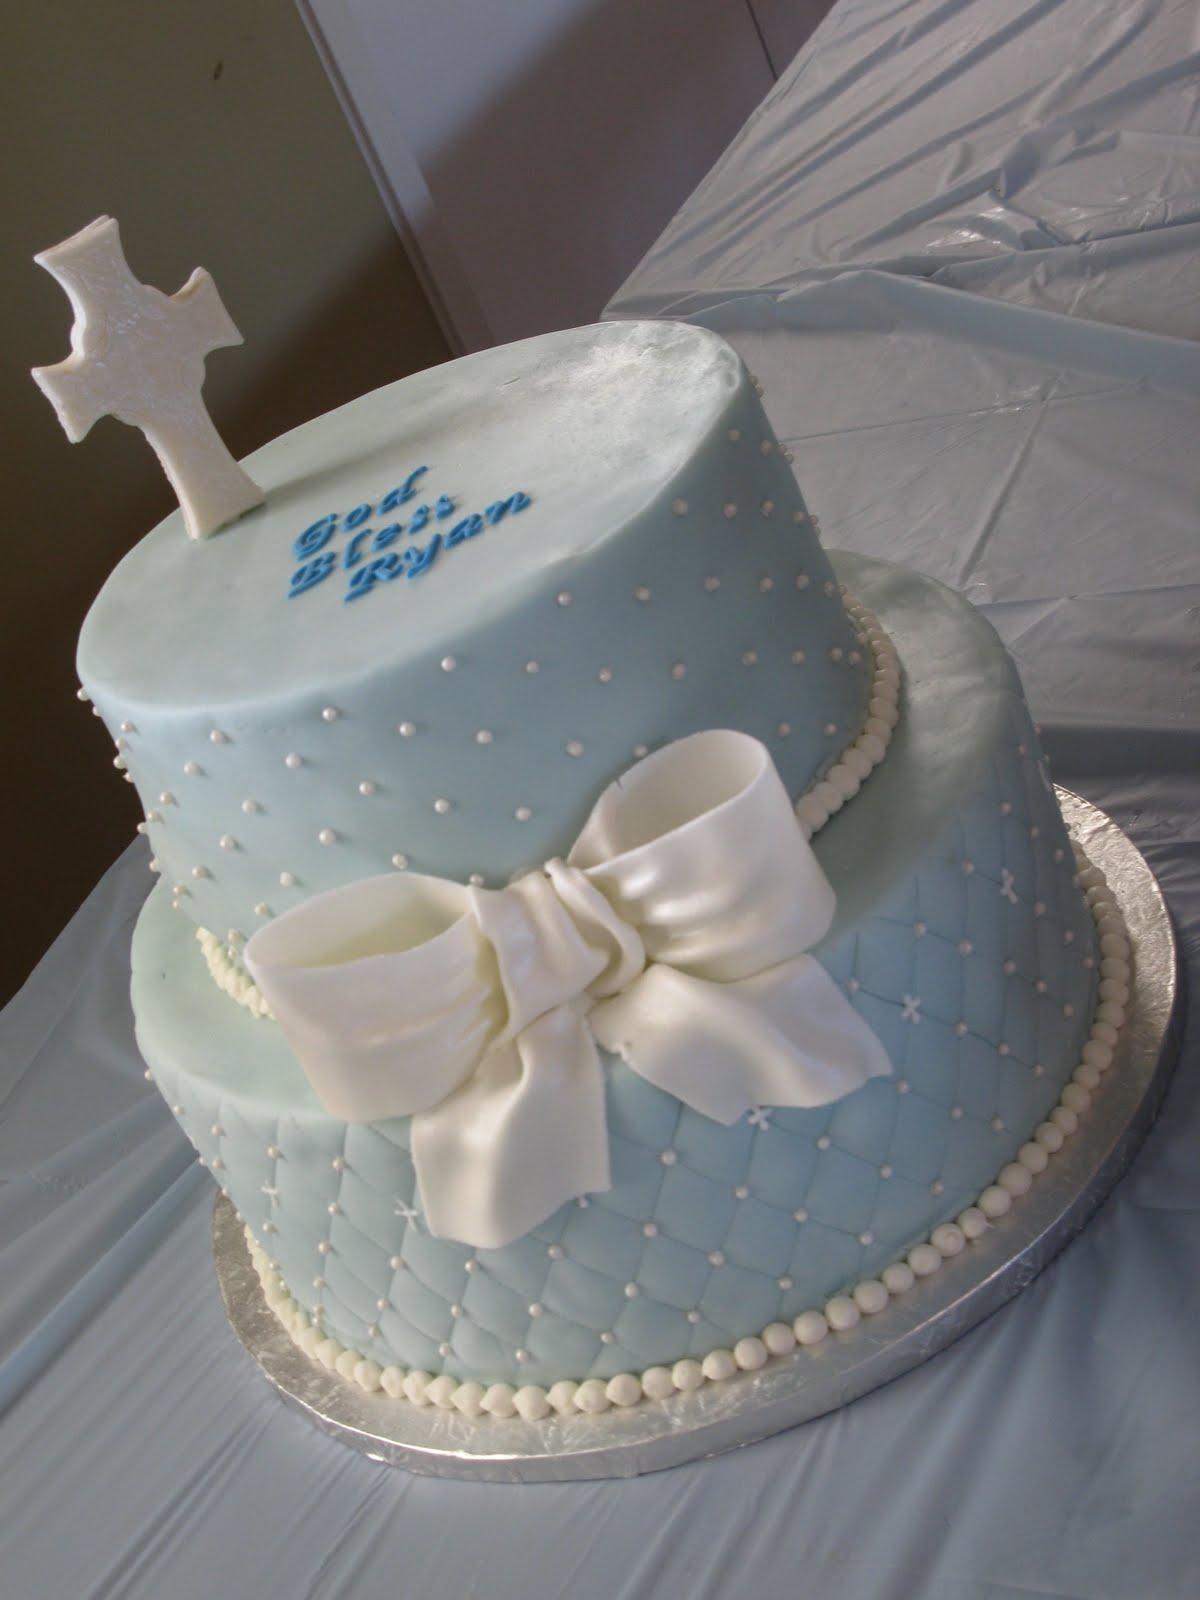 Creations by Barbara: Baptism Cake